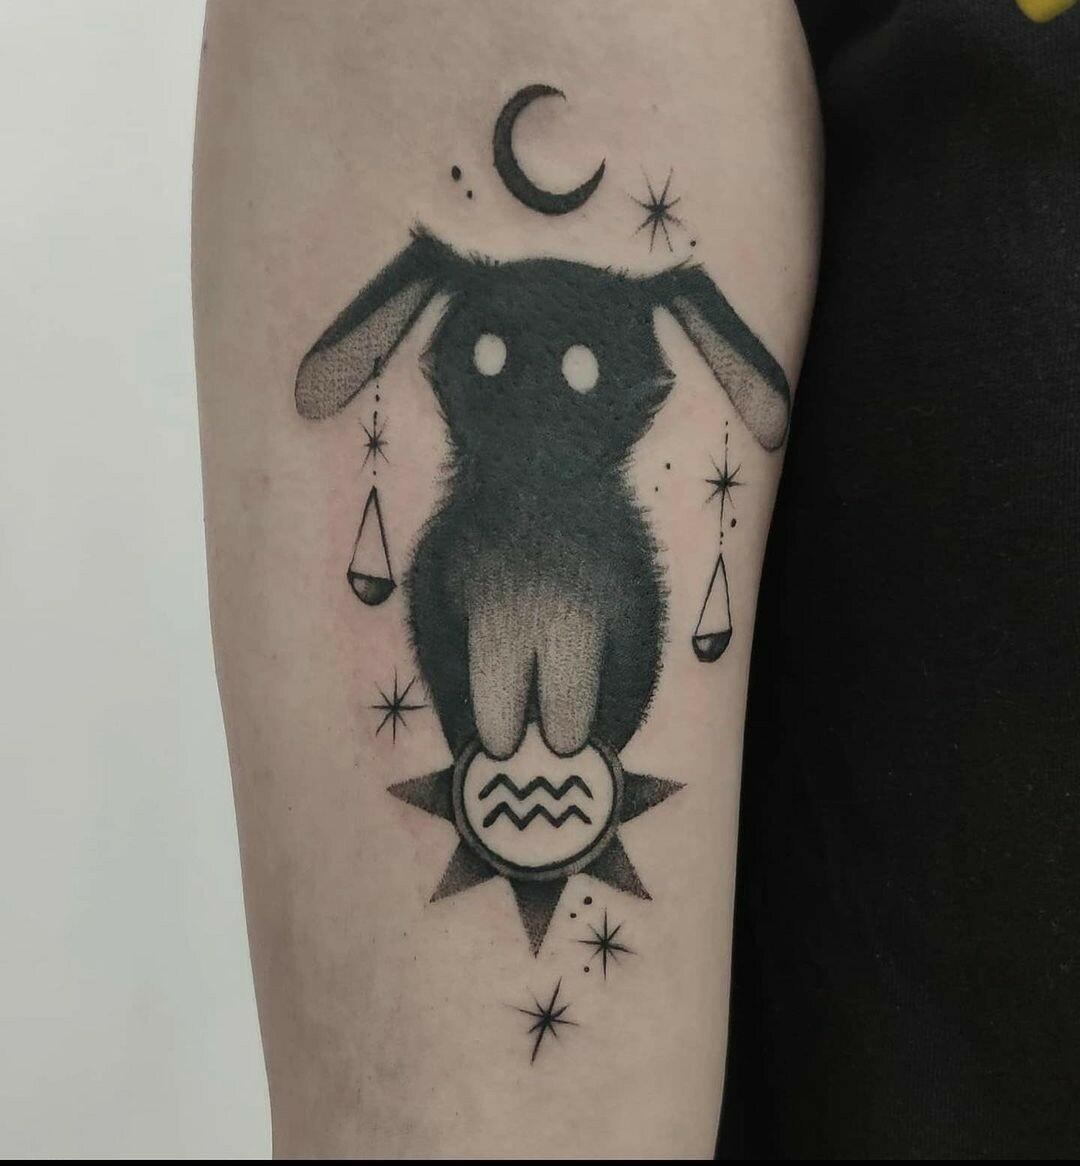 Inksearch tattoo Kinky Needle Tattoo